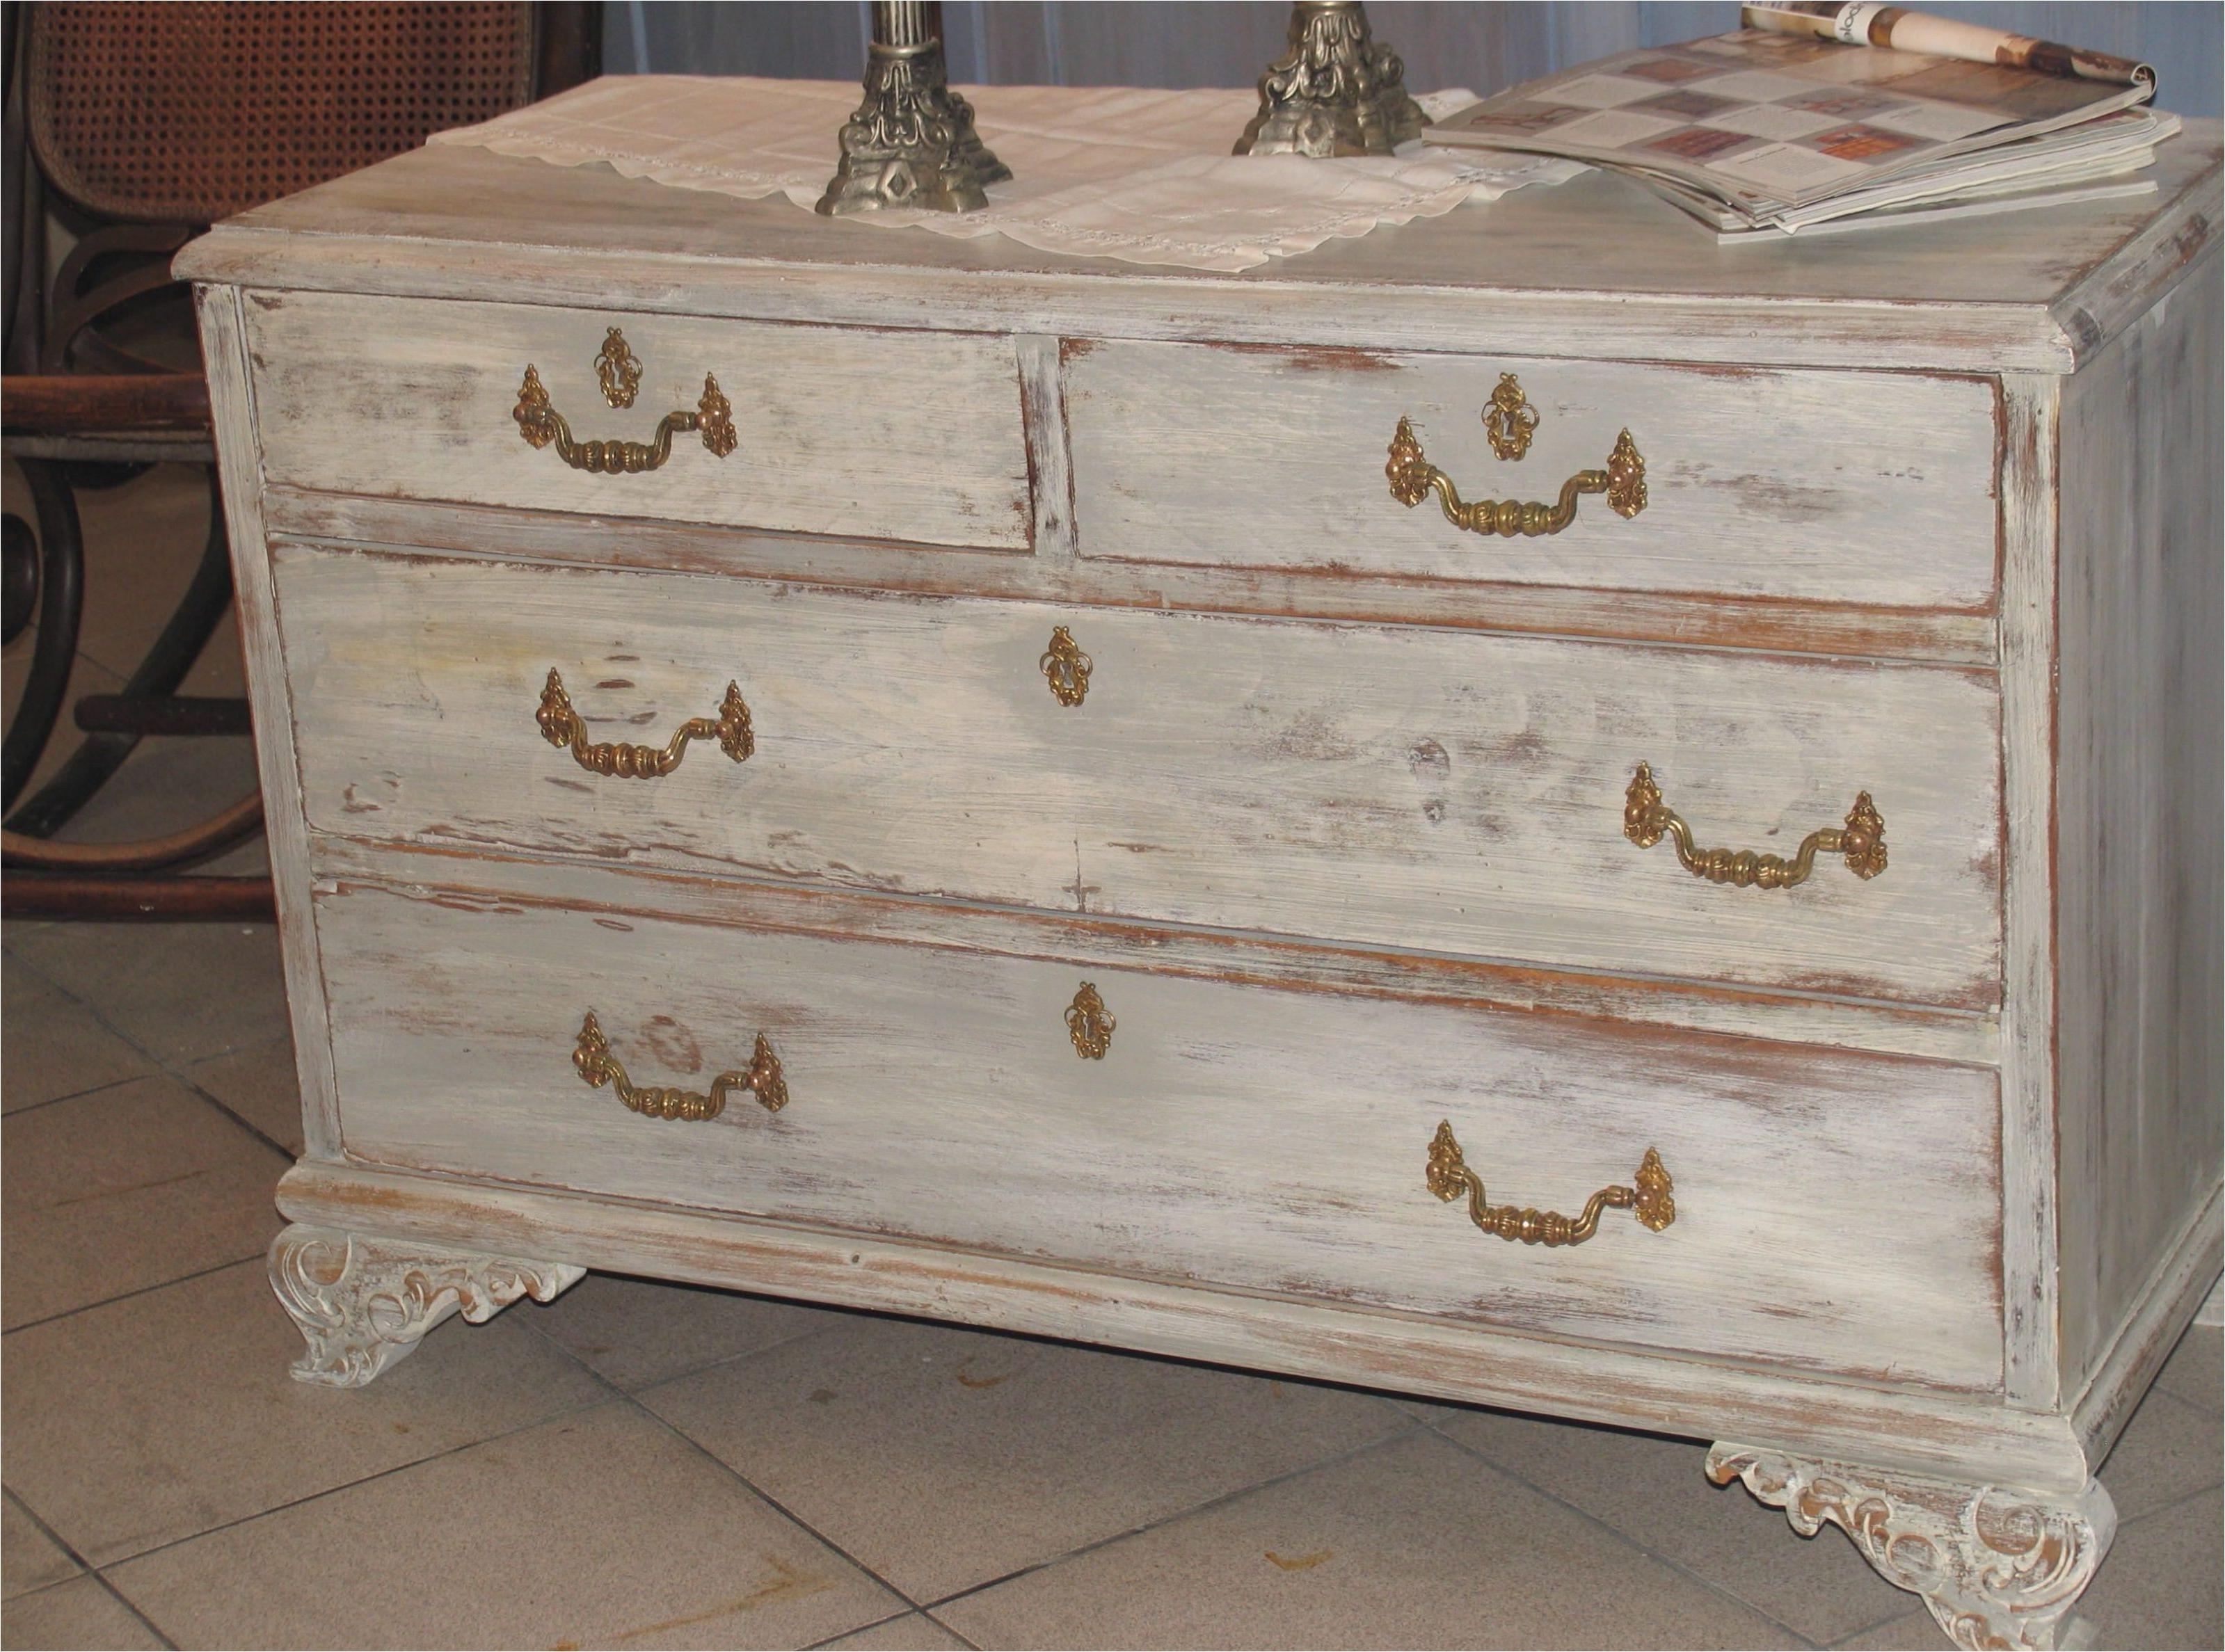 Restaurar Mueble Antiguo A Moderno Dwdk Restaurar Mueble Antiguo A Moderno Hermoso Coleccià N Inicio Ideas